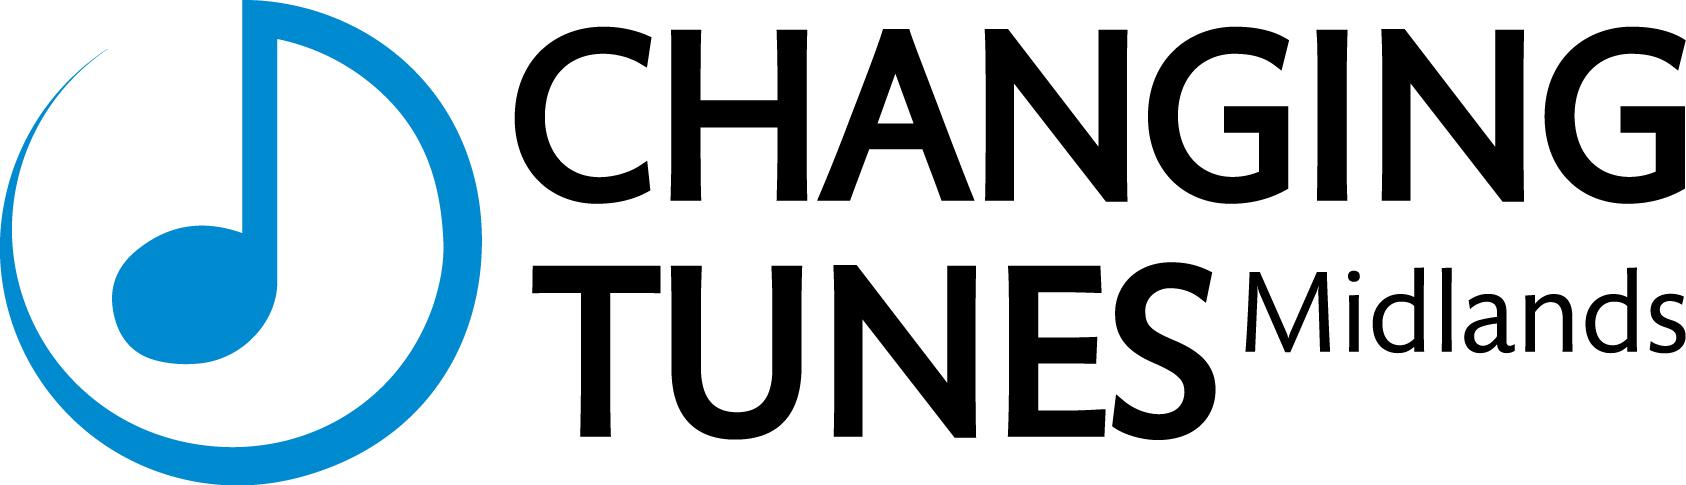 Changing-Tunes-Midlands.jpg